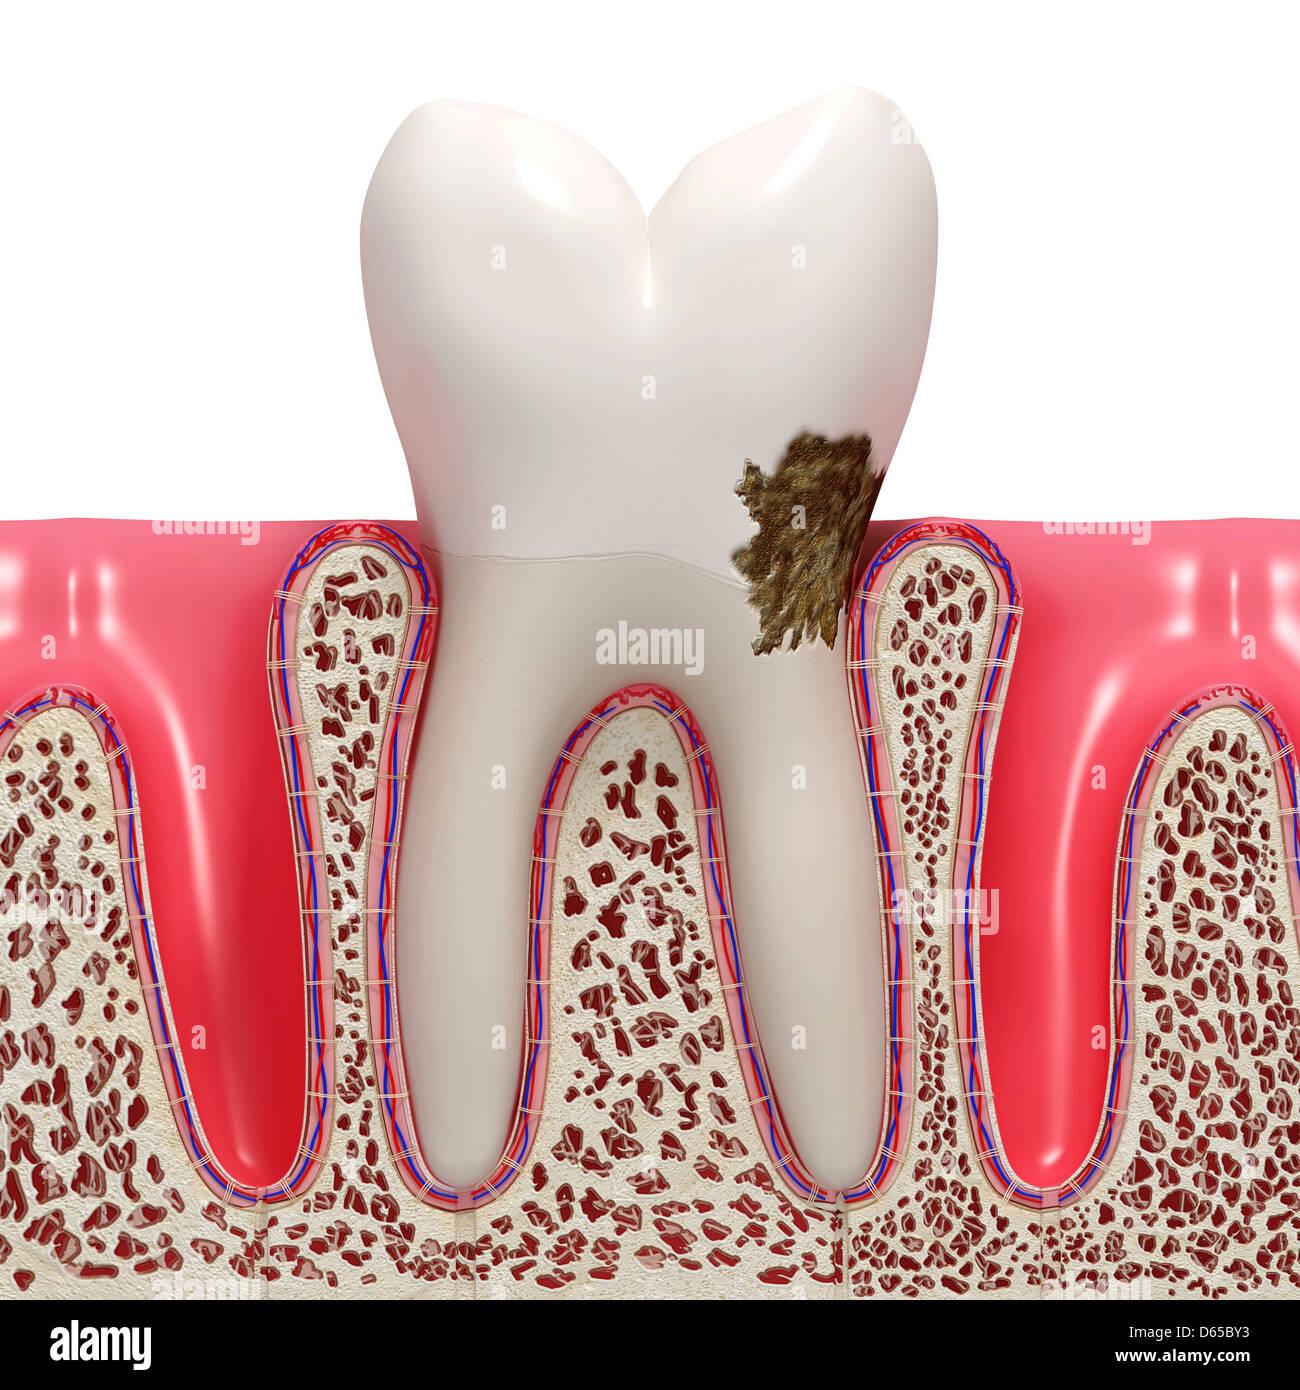 La placca dentale, artwork Foto Stock